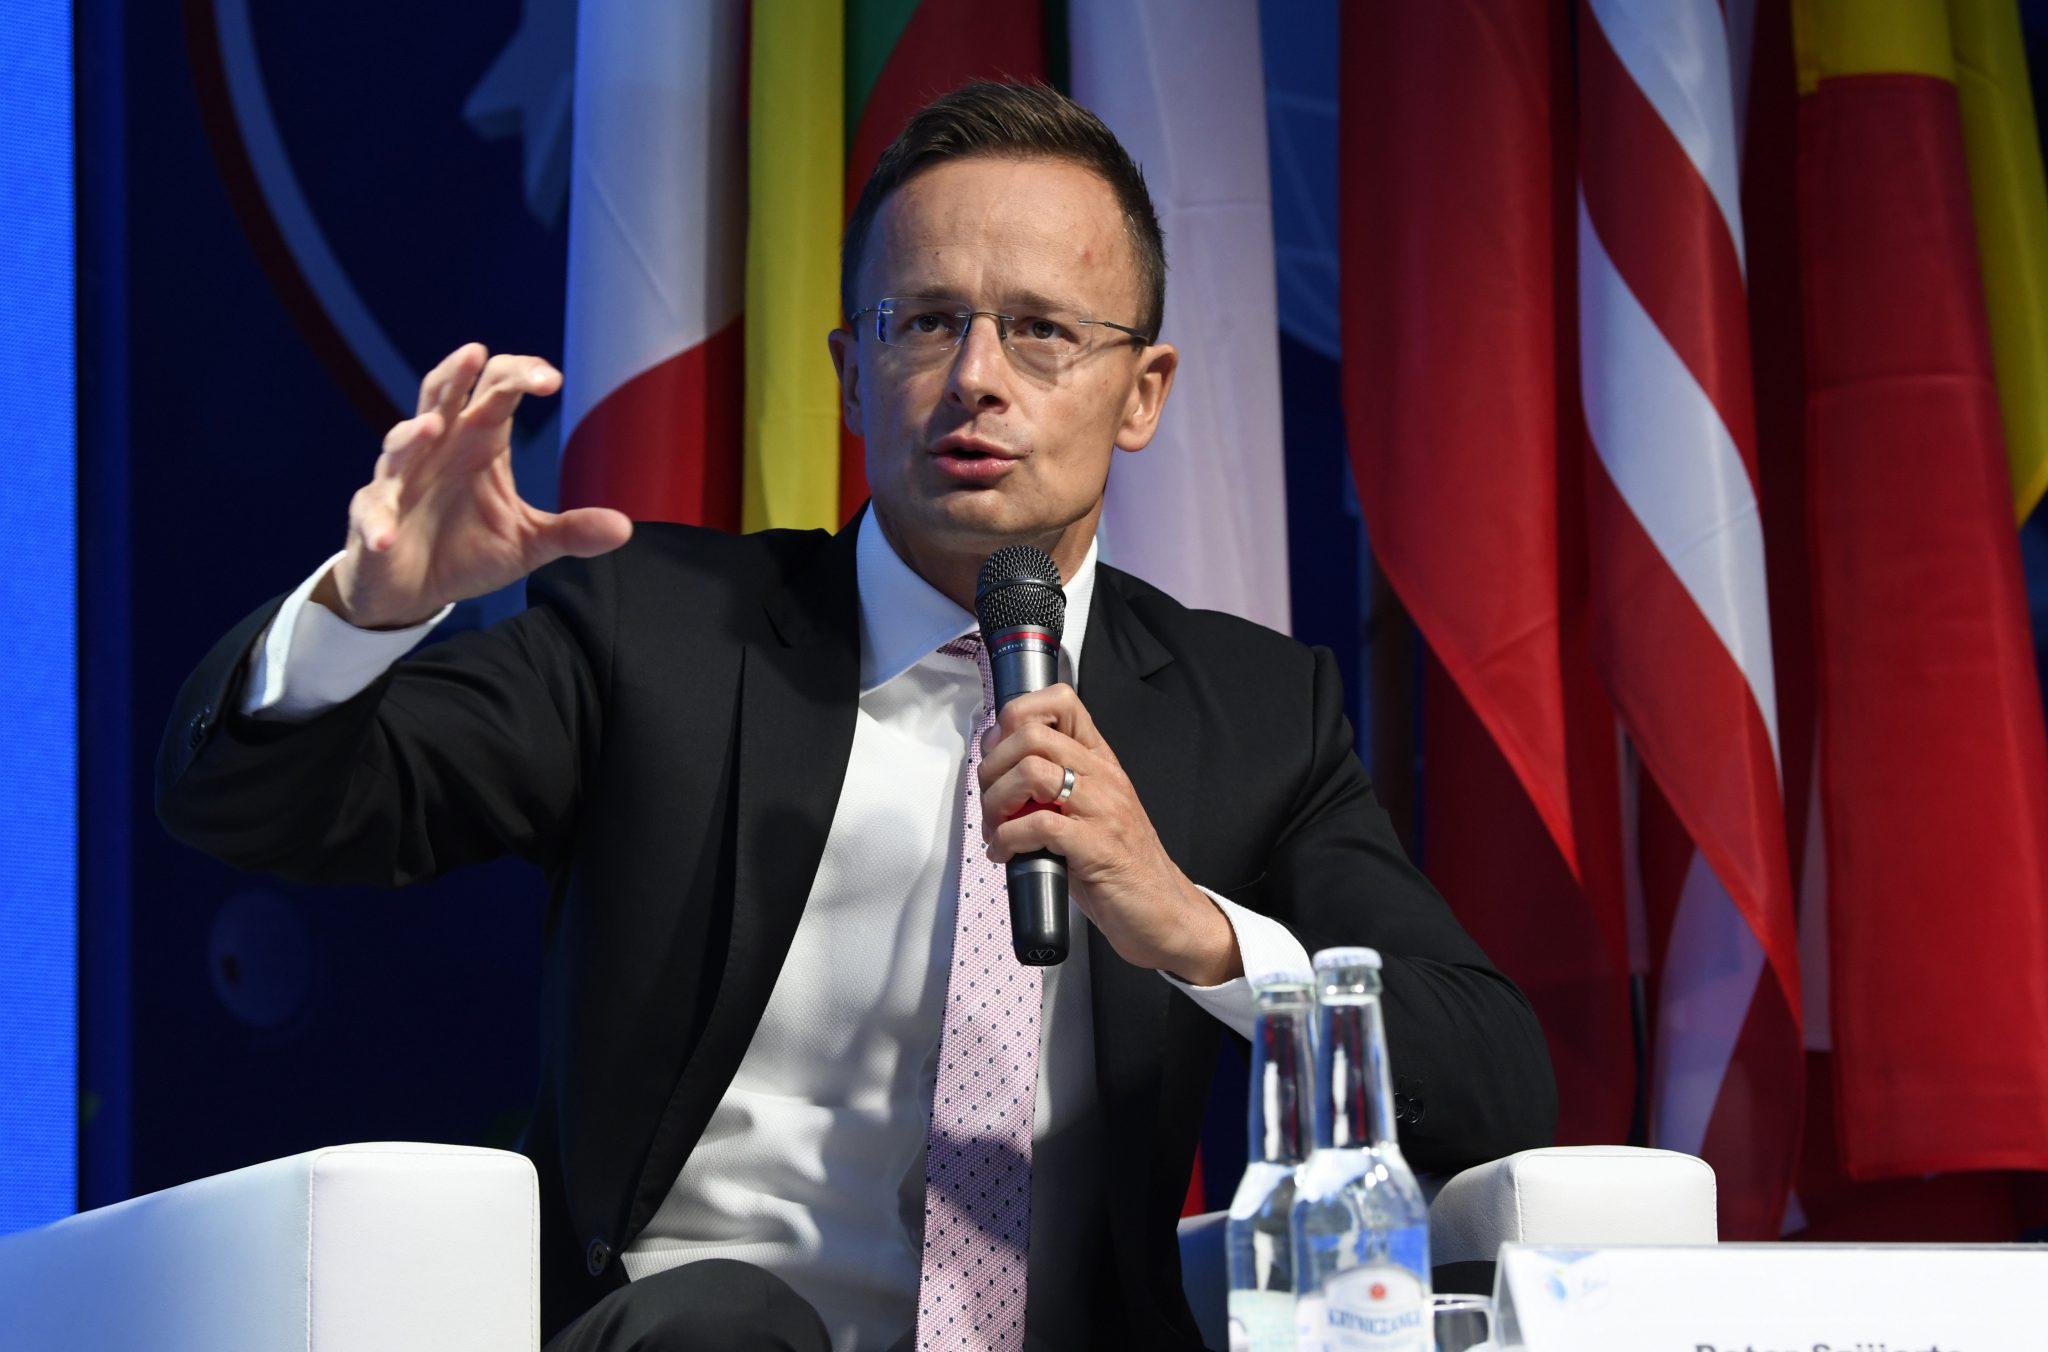 Szijjártó: West Wants to 'Break C Europe Competiteveness' through 'Socialist-Type' Proposals post's picture